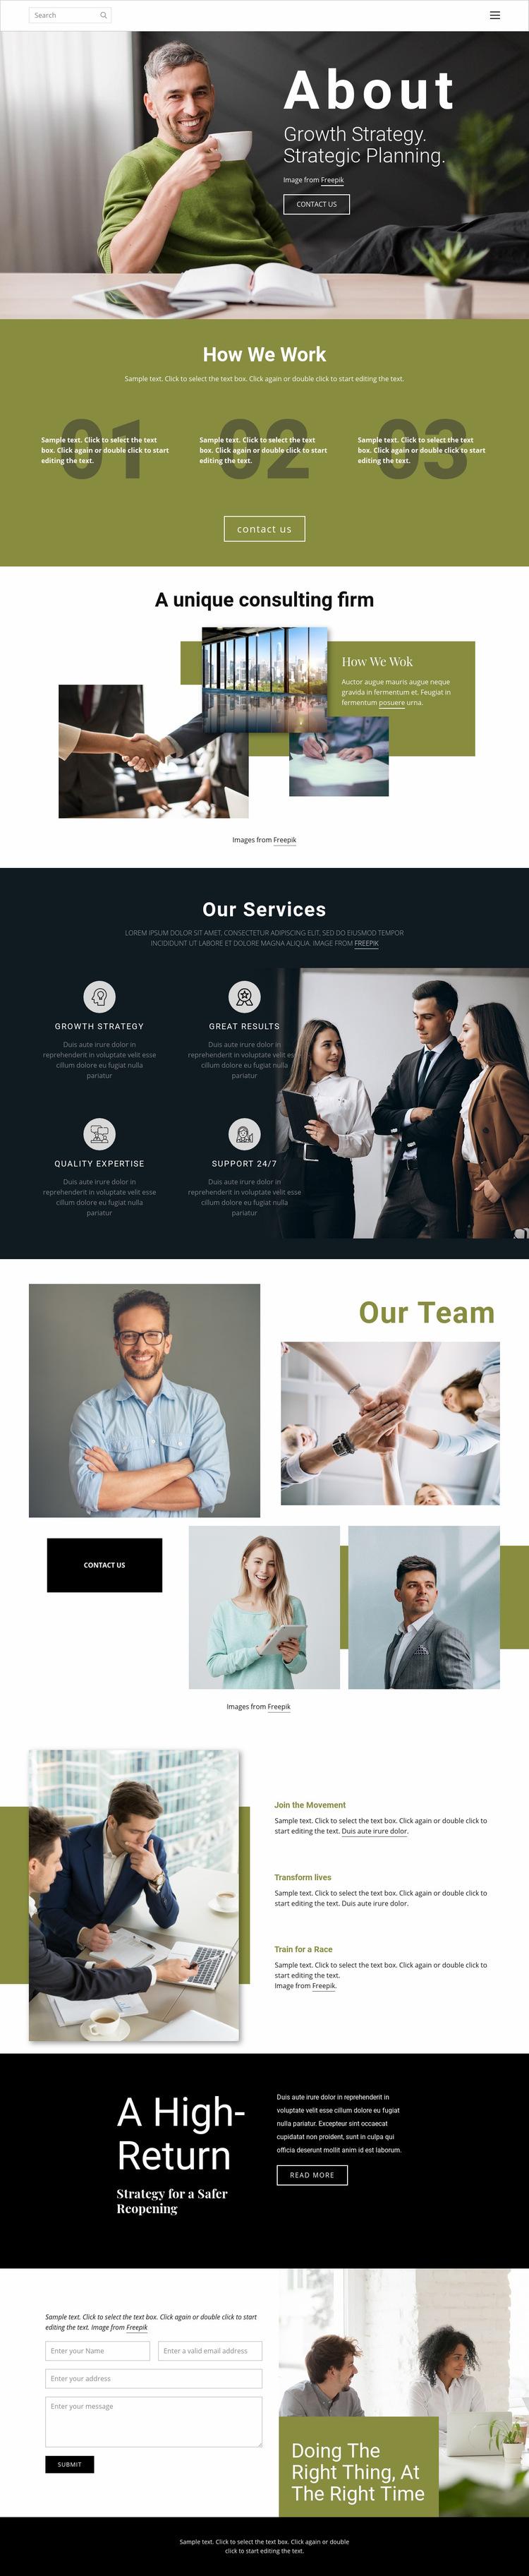 Strategic planning Web Page Design